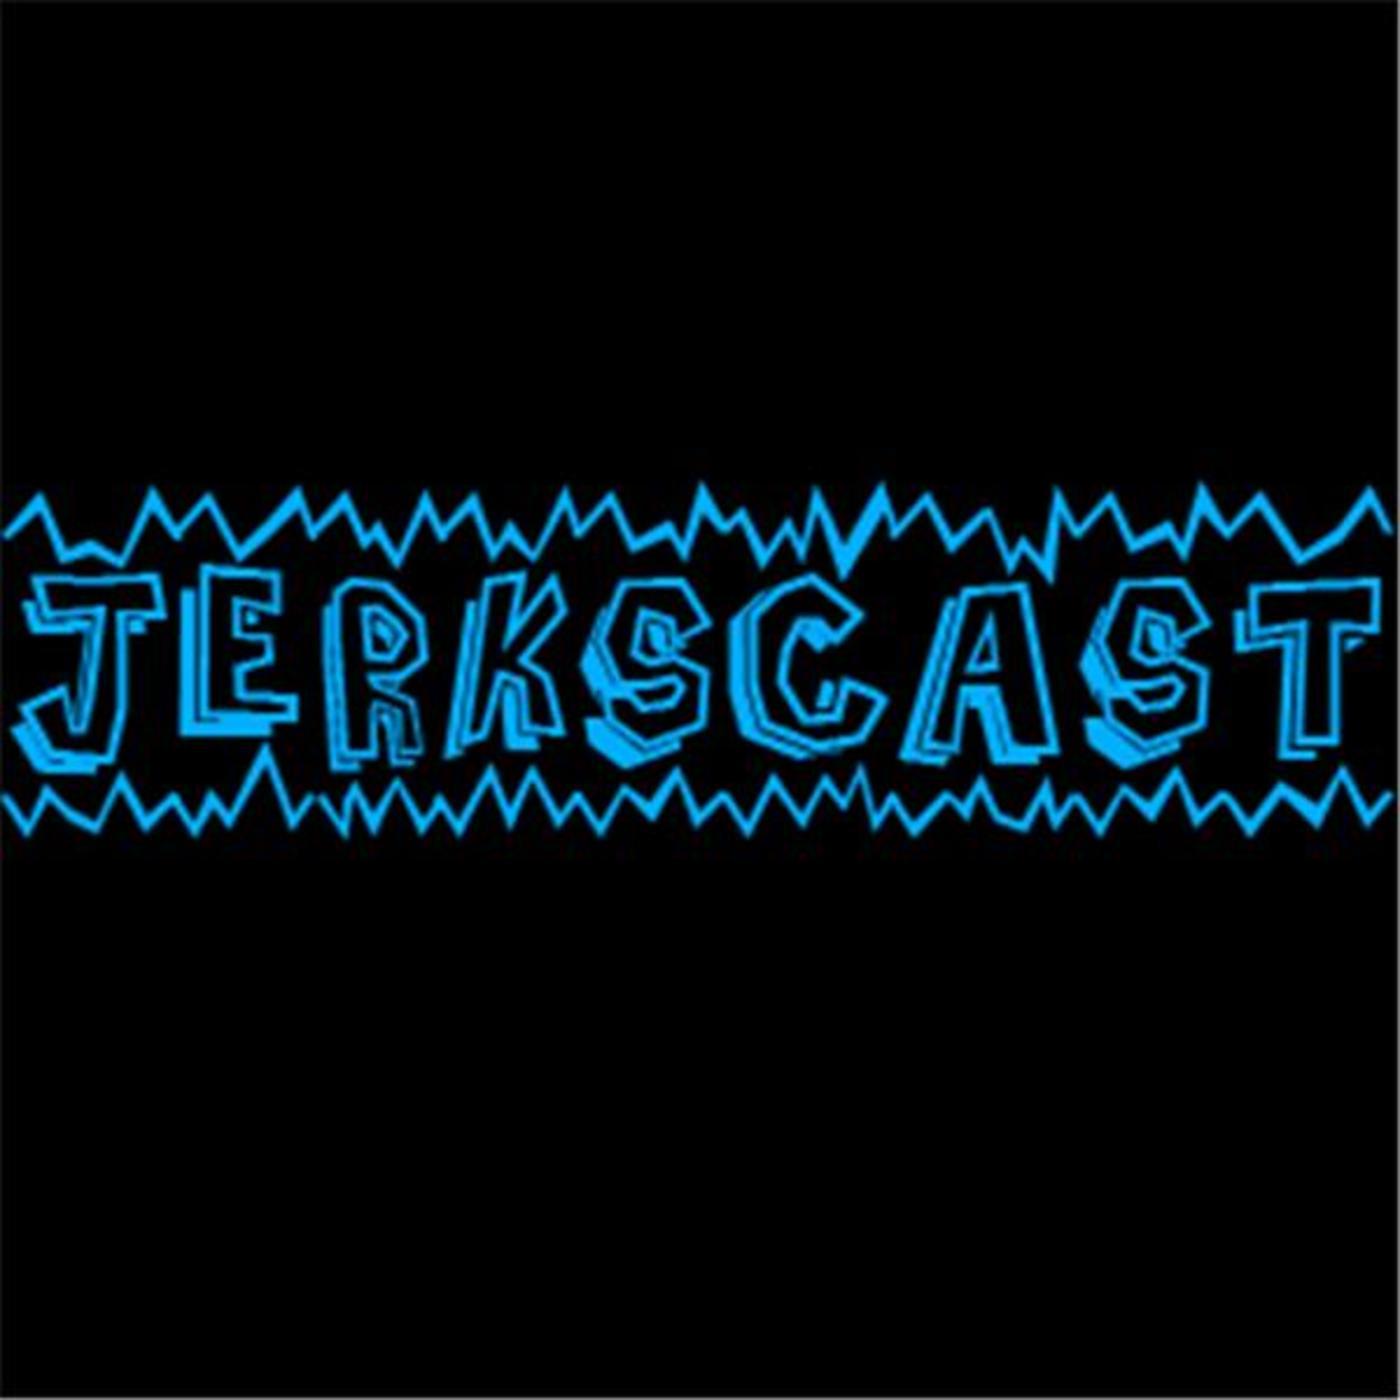 Jerkscast